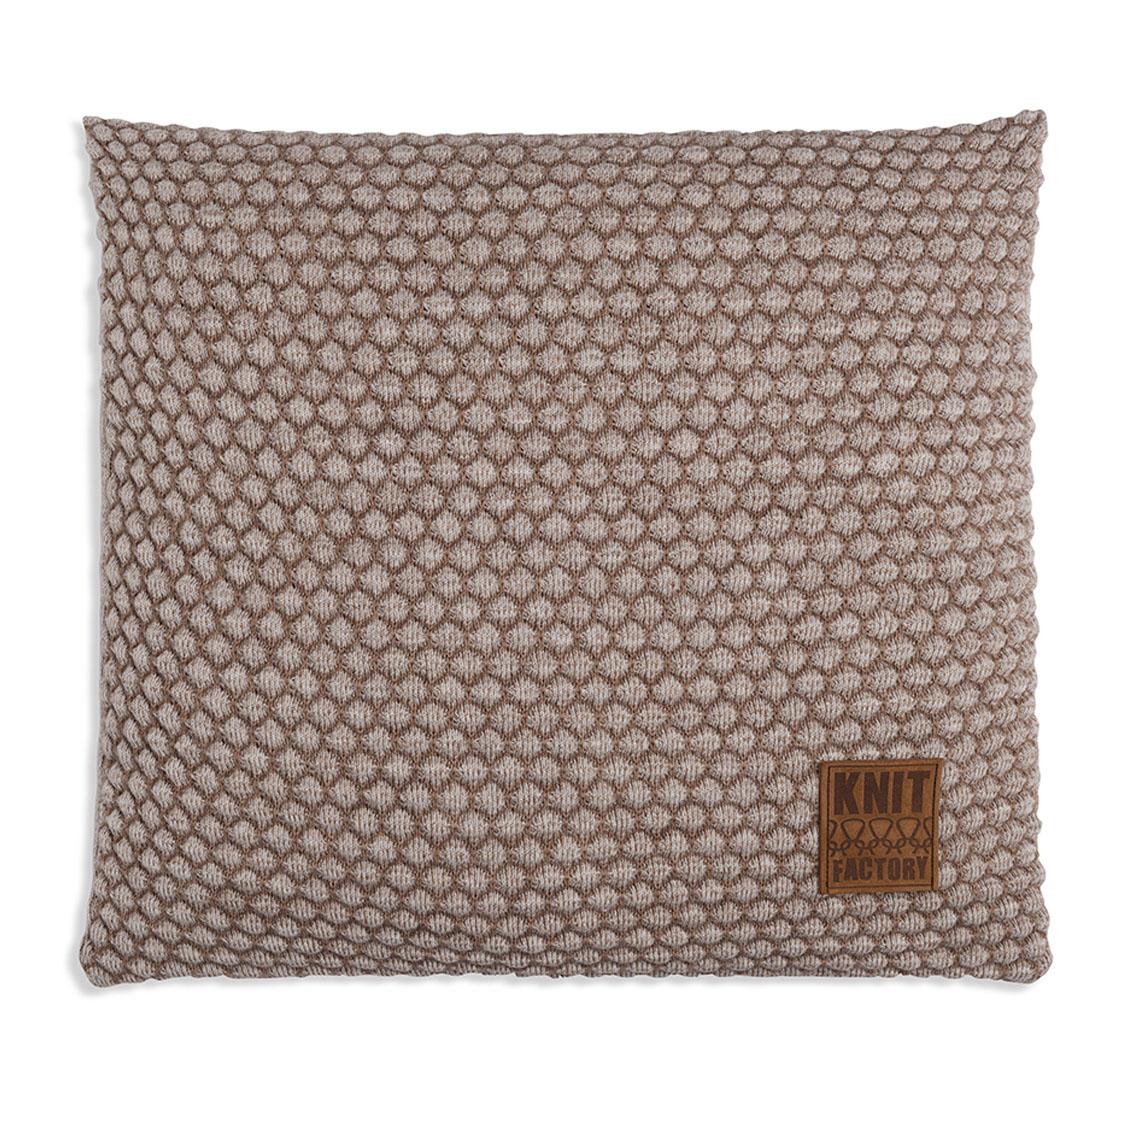 juul cushion marronbeige 50x50